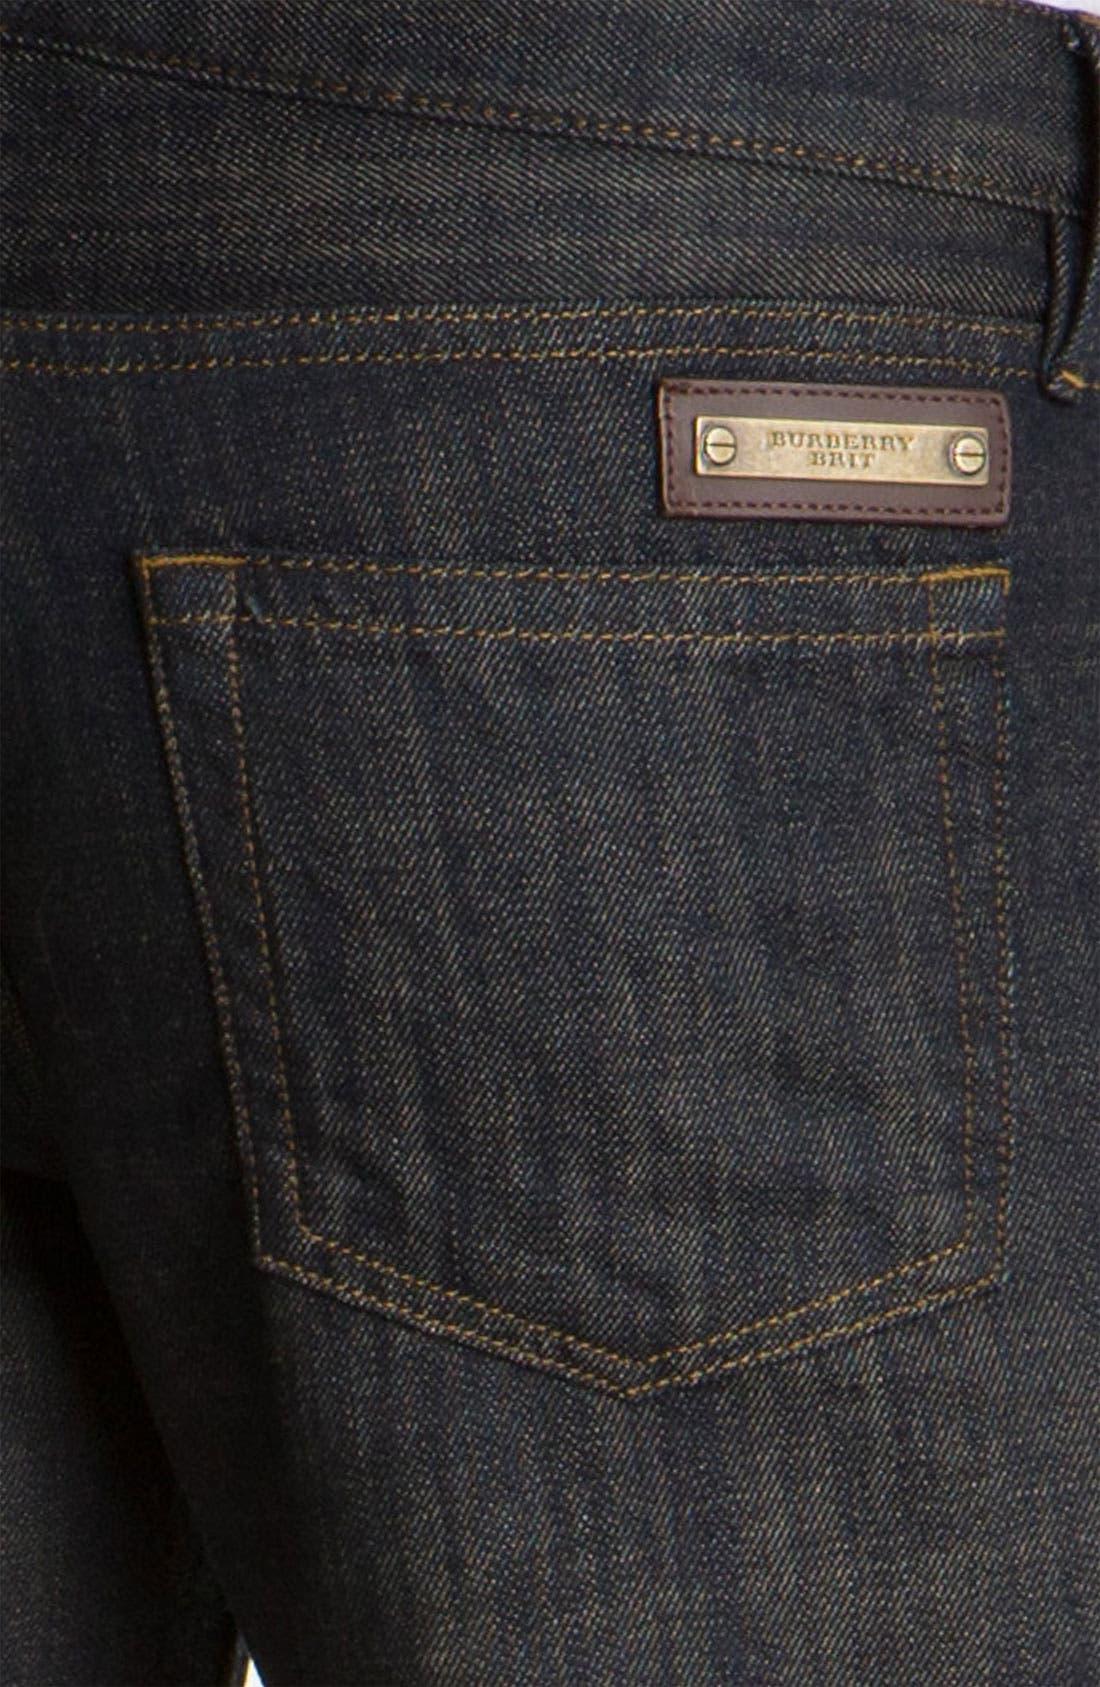 Alternate Image 4  - Burberry Brit 'Cavendish' Resin Washed Denim Jeans (Indigo Blue)